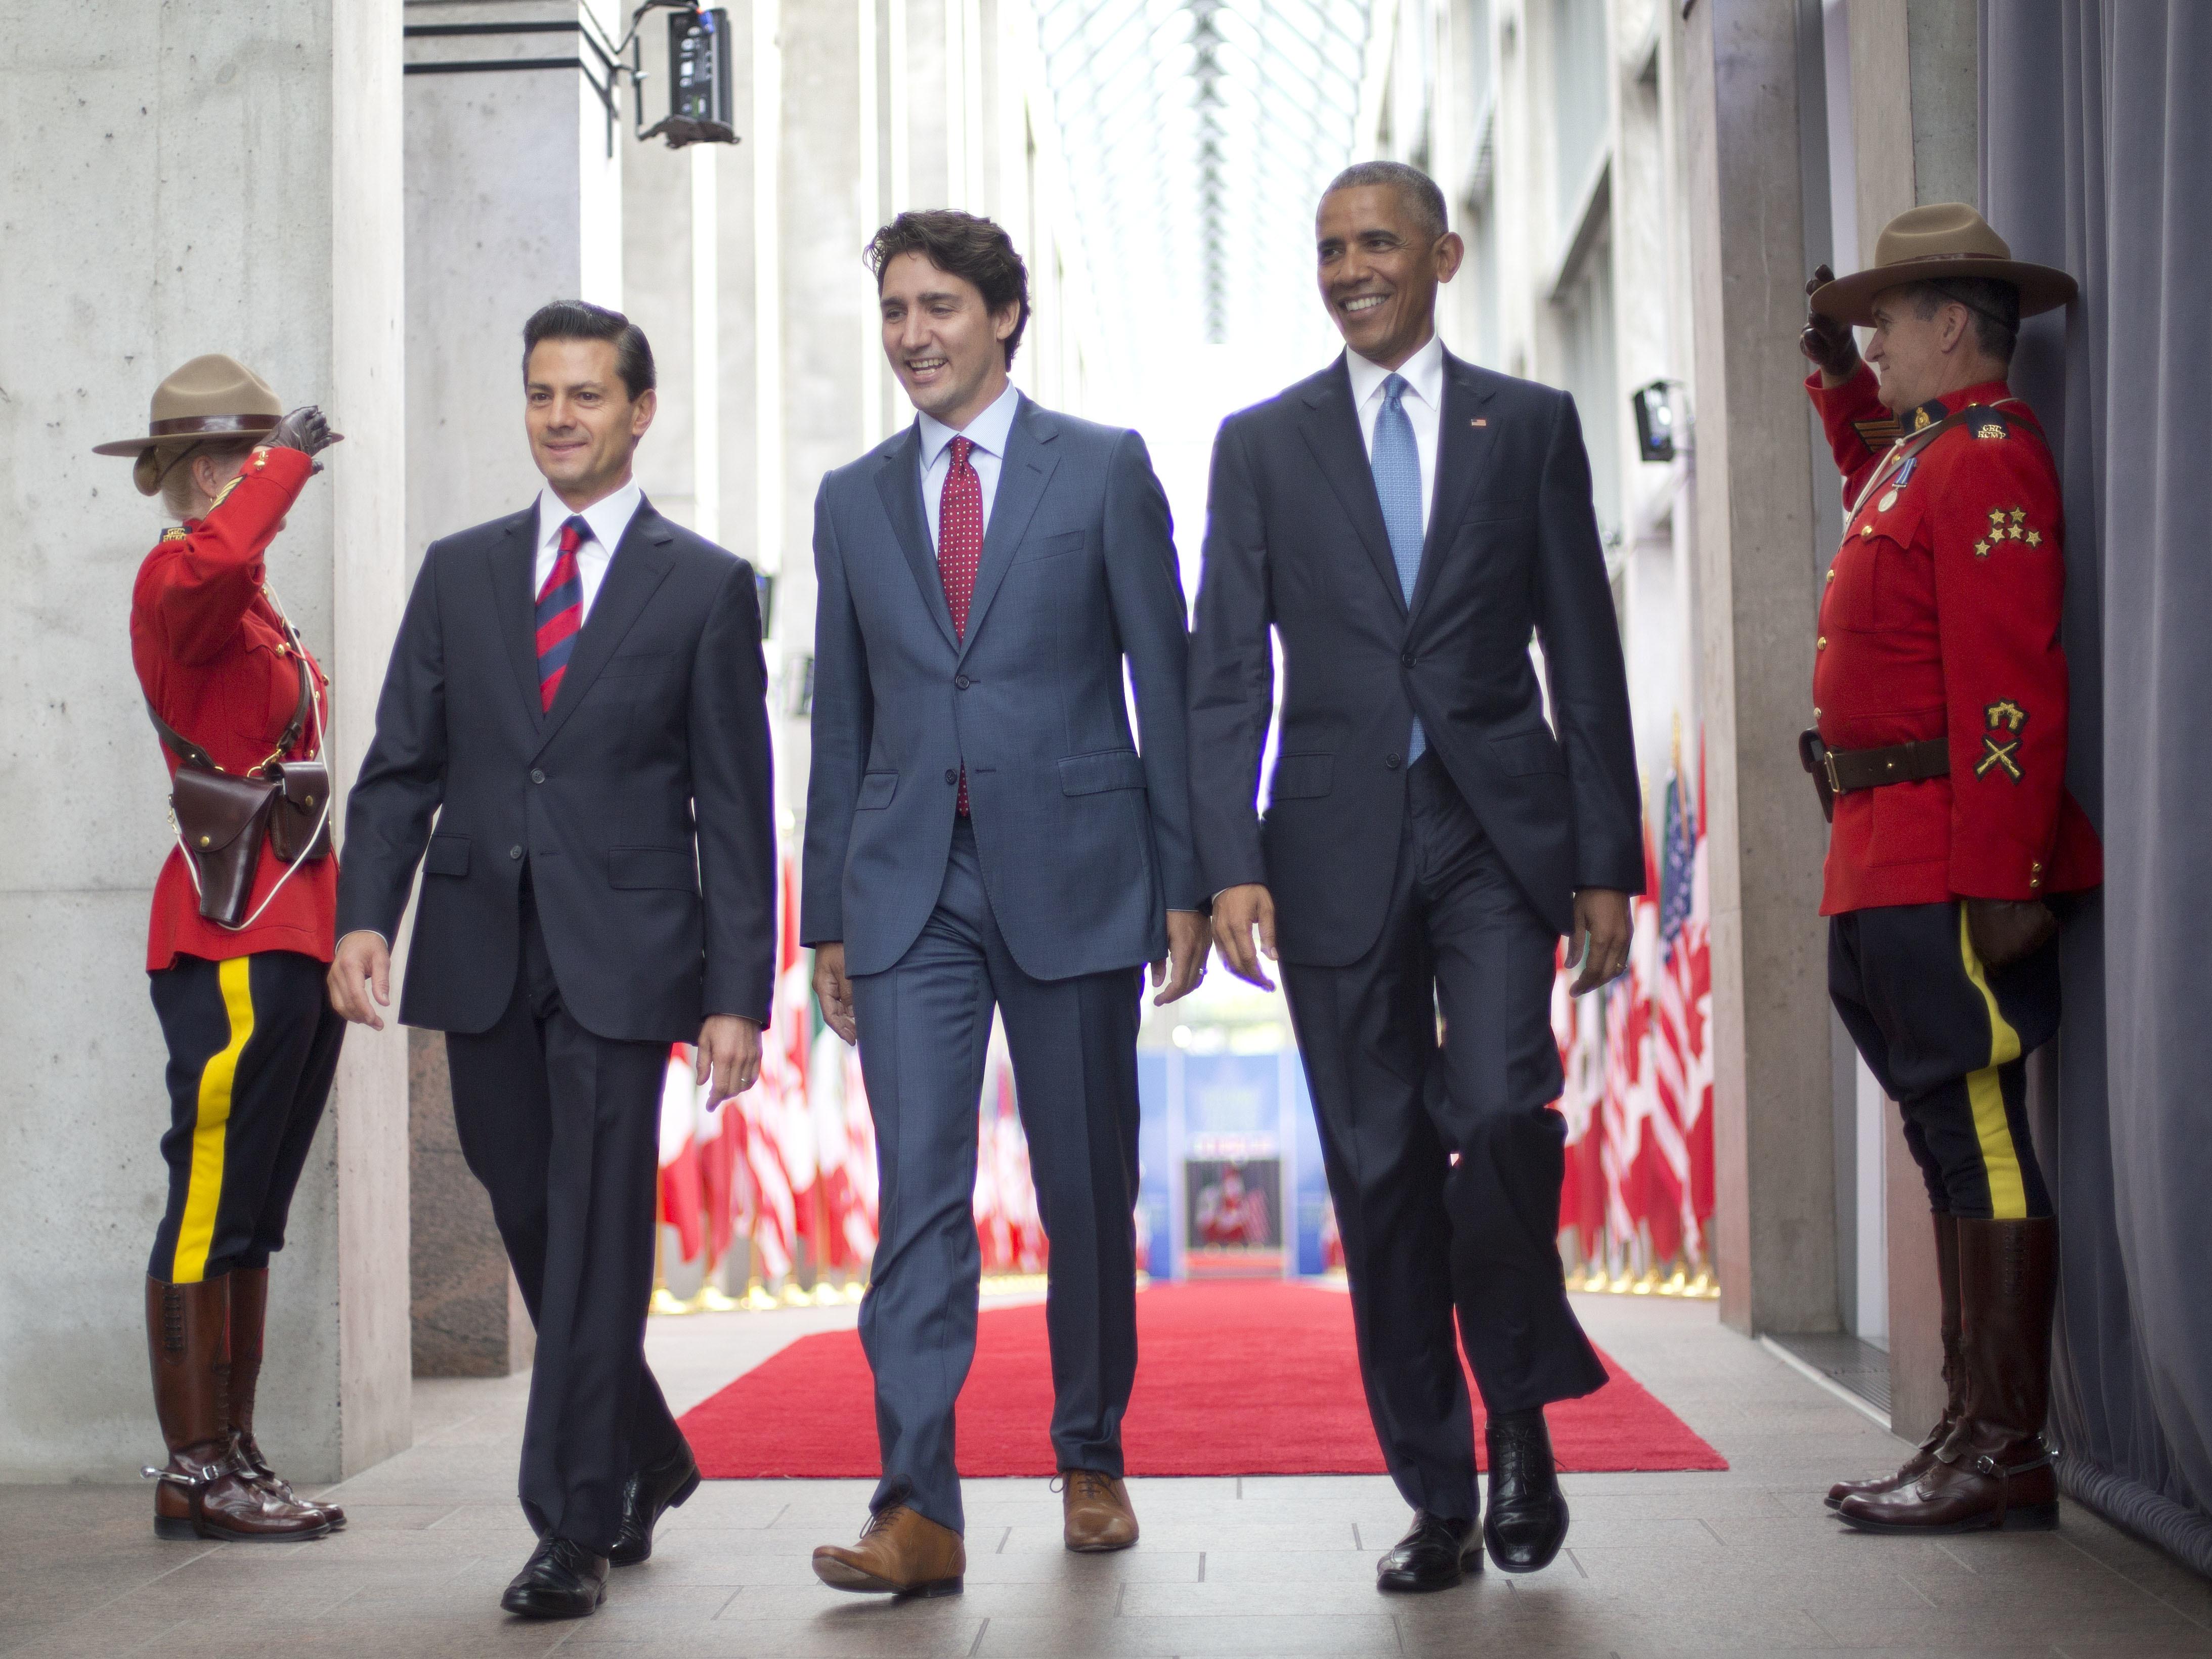 #MemeOfTheWeek: Obama, Trudeau And Peña Nieto As The Three Amigos